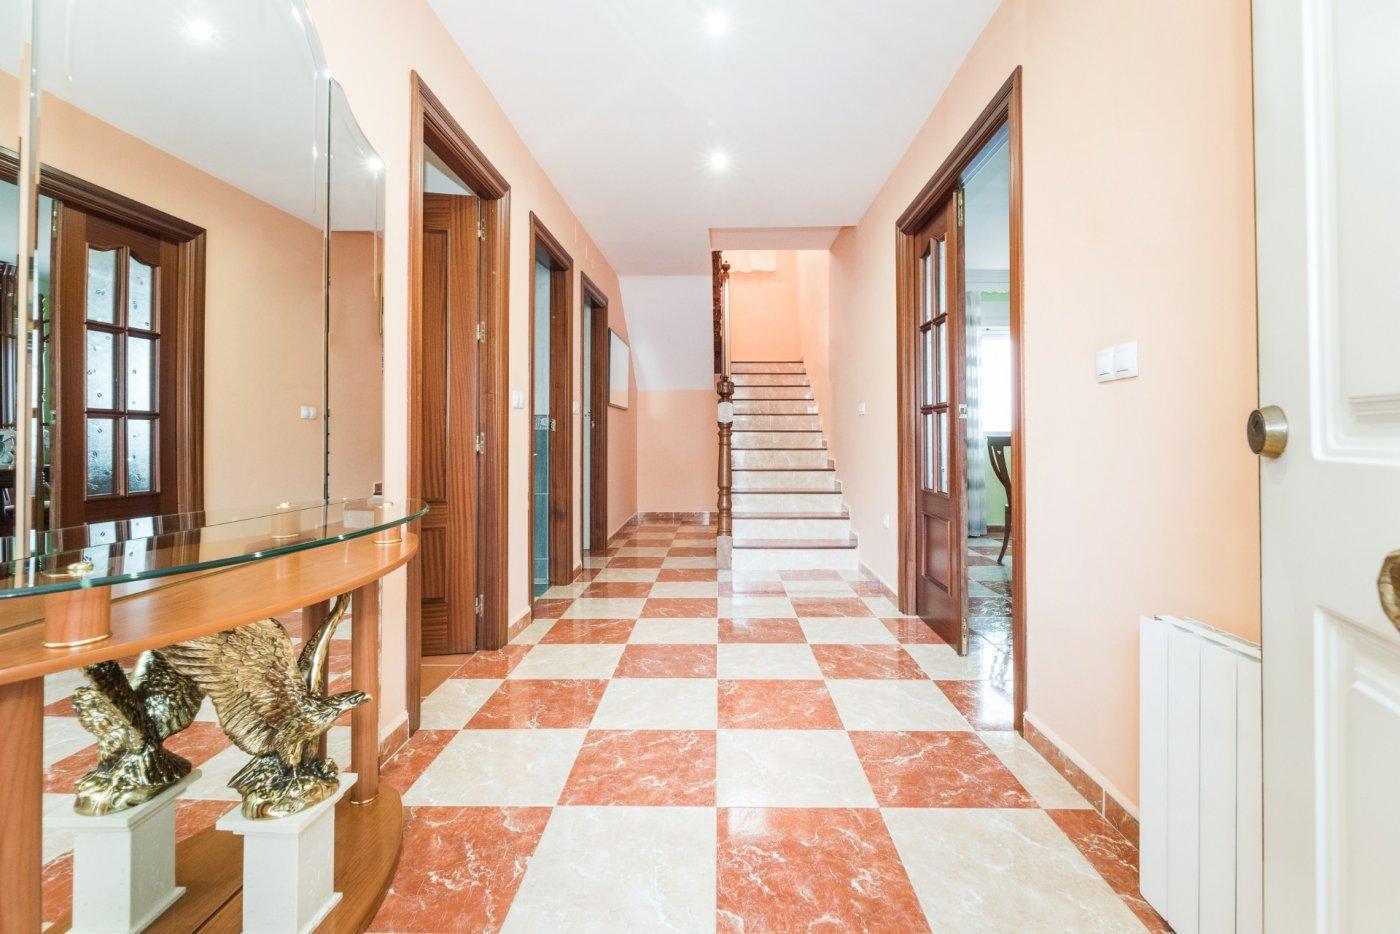 Preciosa casa adosada ubicada en zona tranquila de belicena.